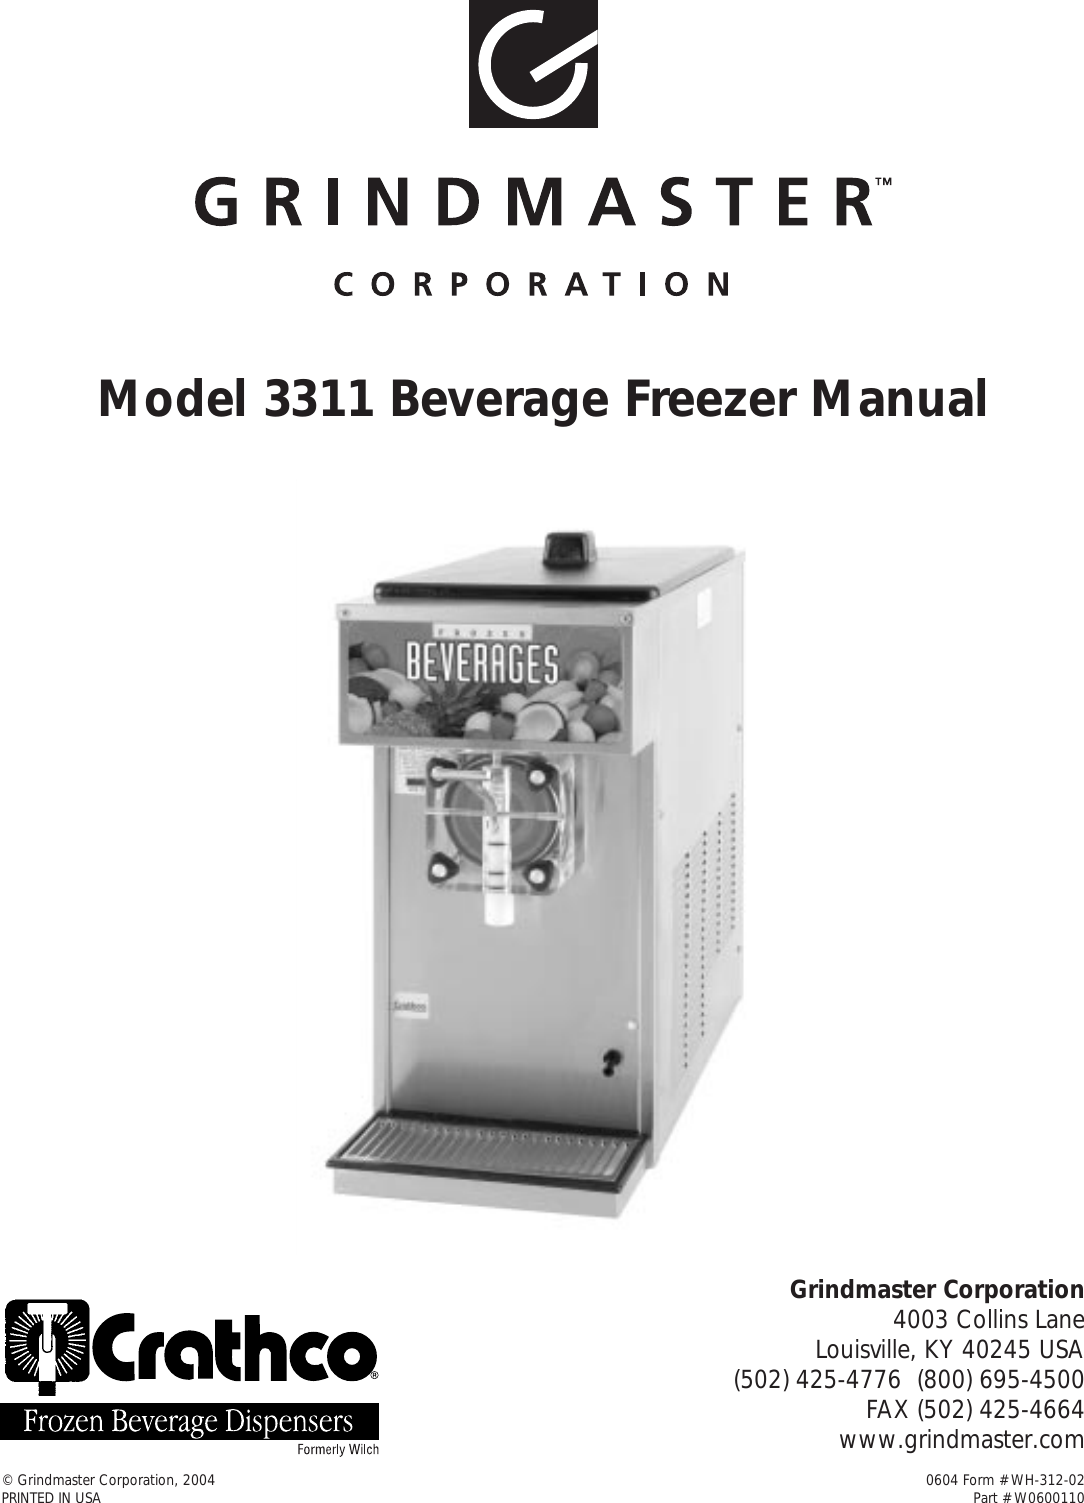 Beverage Air Grindmaster 3311 Users Manual Wh 312 01 Freezer Wiring Diagram